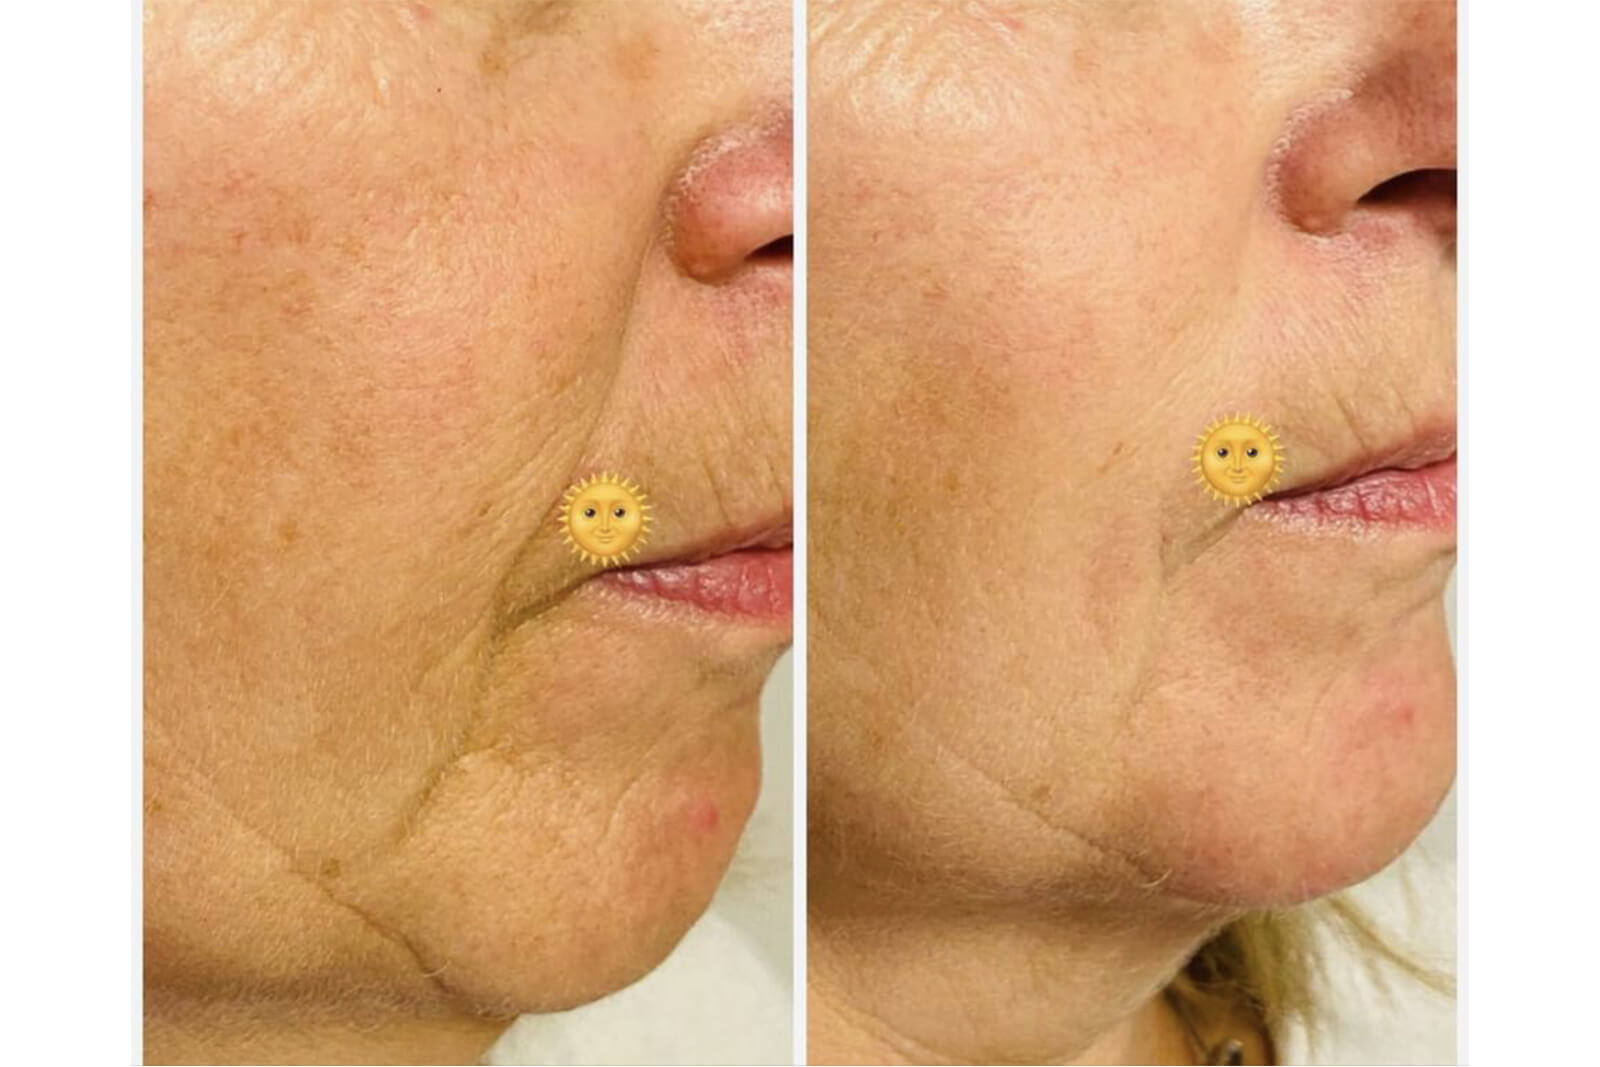 visage - restructuration visage ou profiloplastie 3